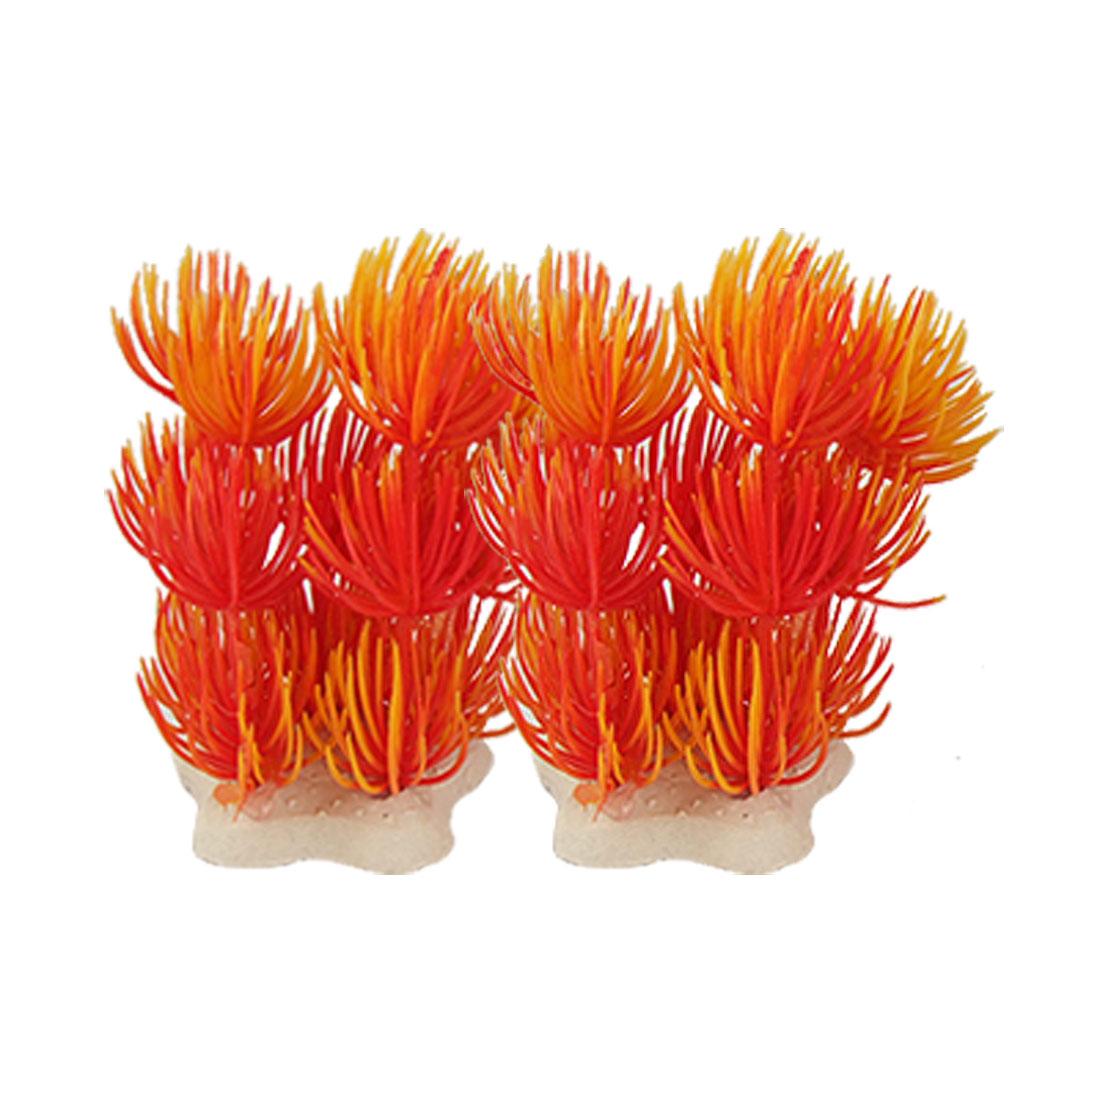 Seastar Shaped Base Orange Red Plastic Grass 2 Pcs for Fish Tank